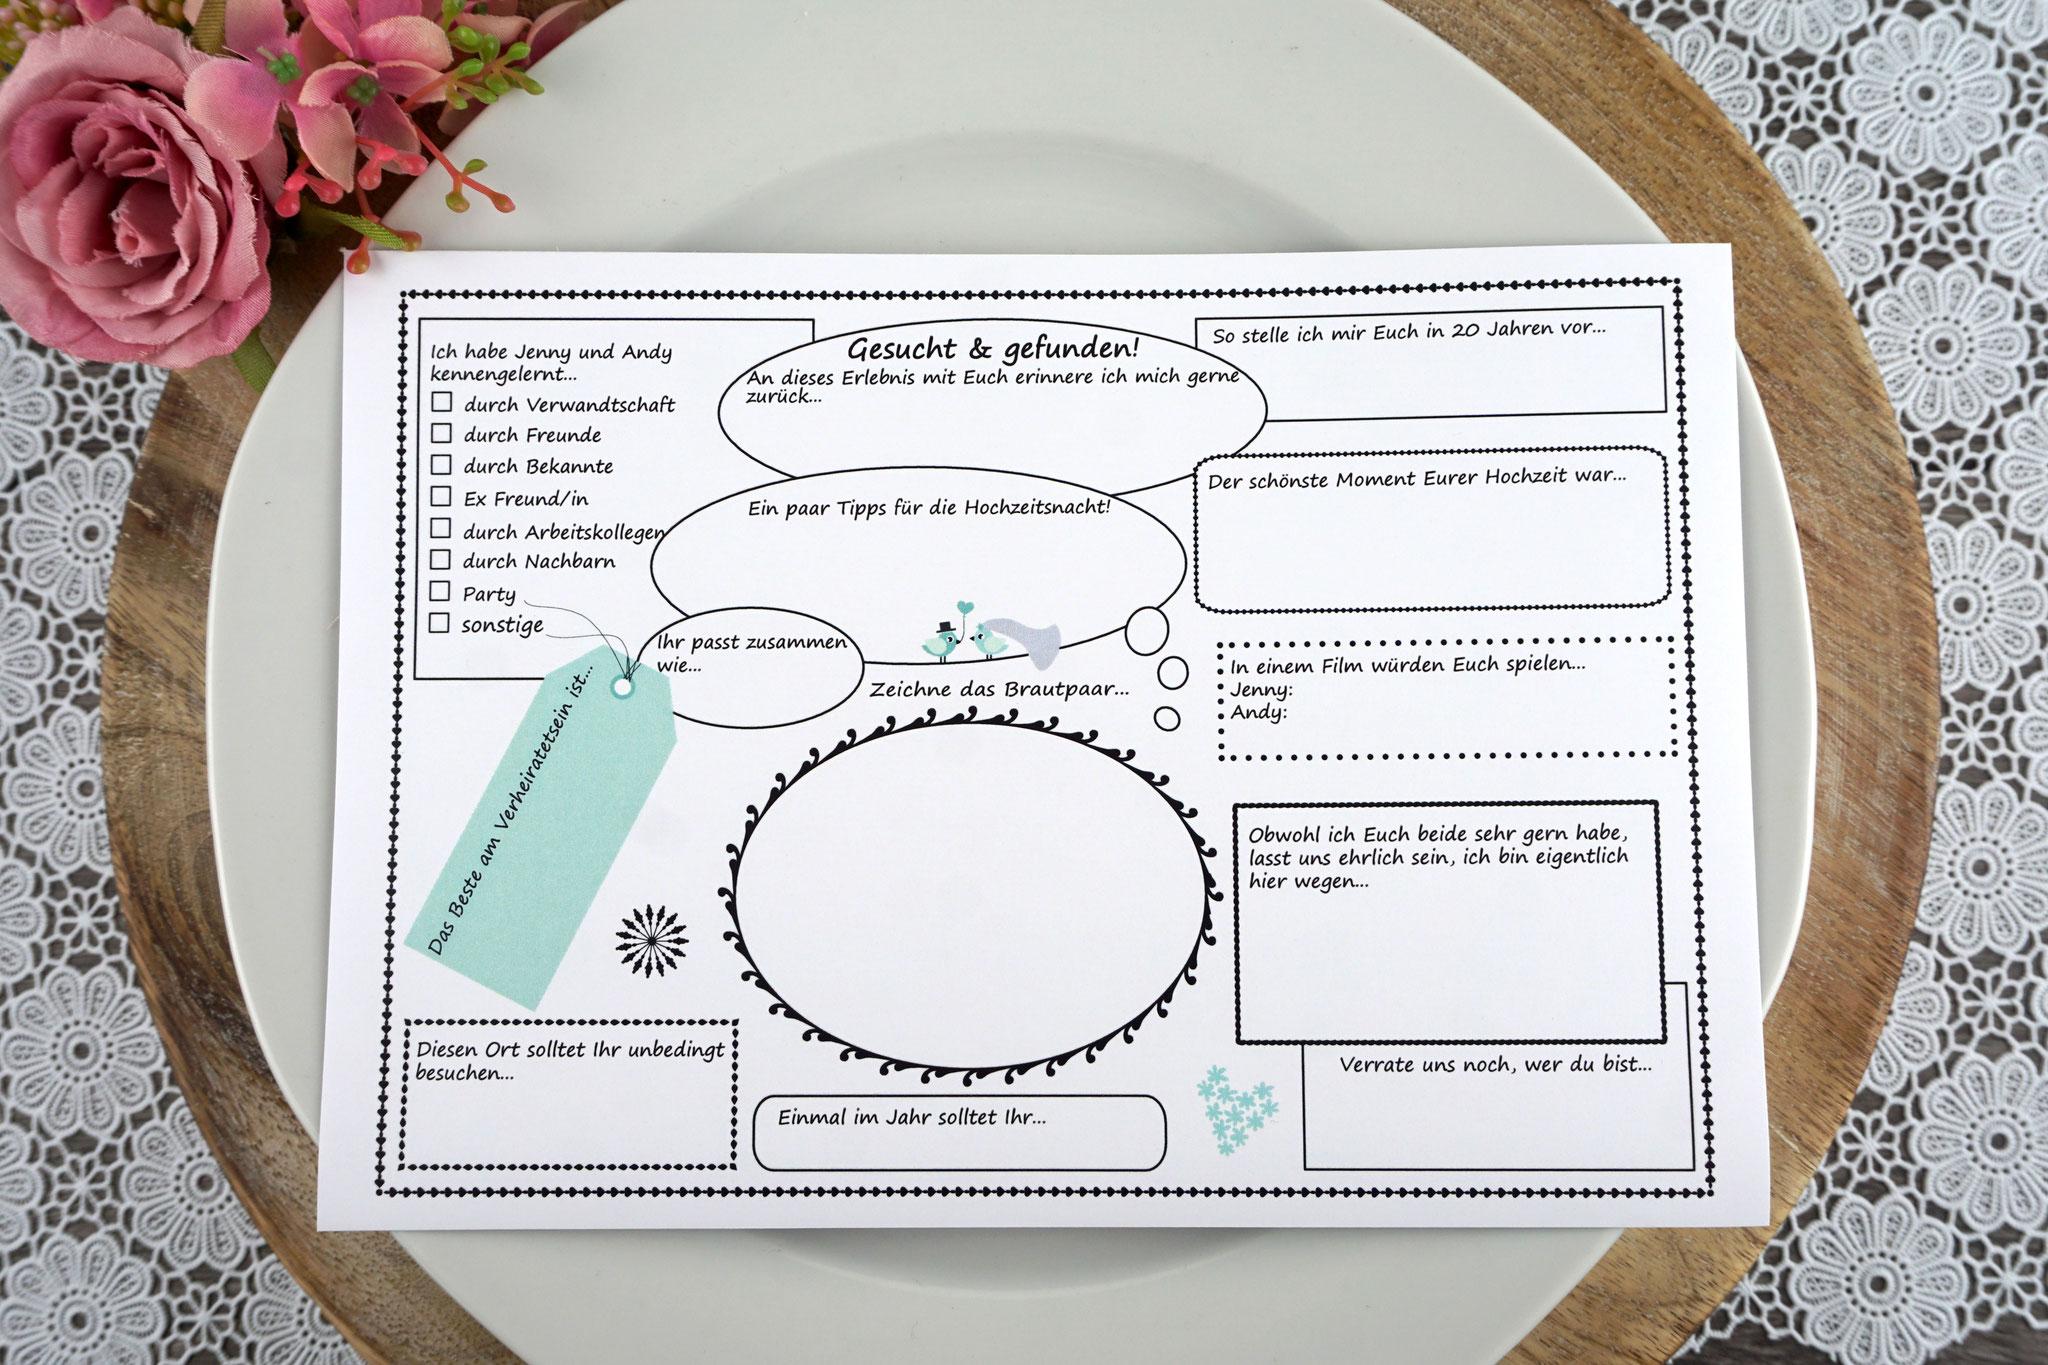 Gästebuch/Gästespiel A5 Personalisiert, Farbe mint - Sonderanfertigung Fragen